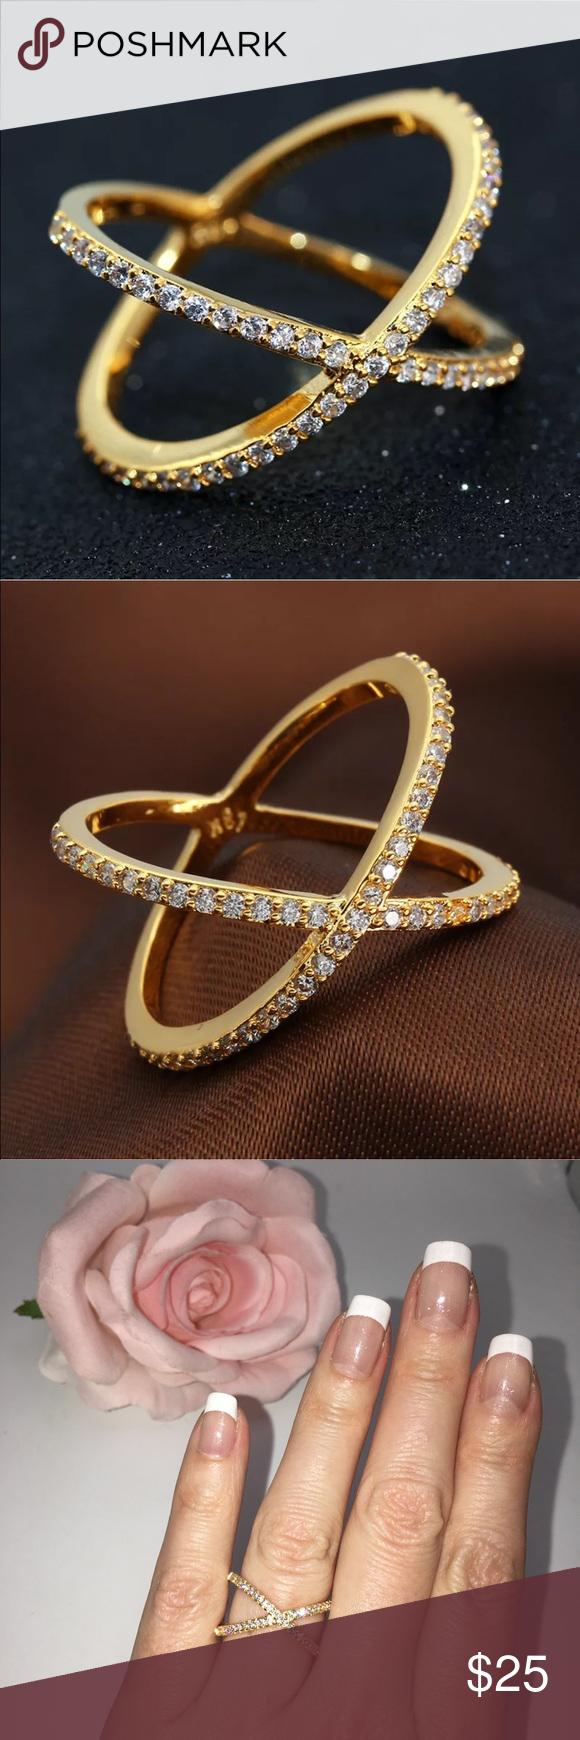 14k yellow Gold X ring criss cross diamond NWT